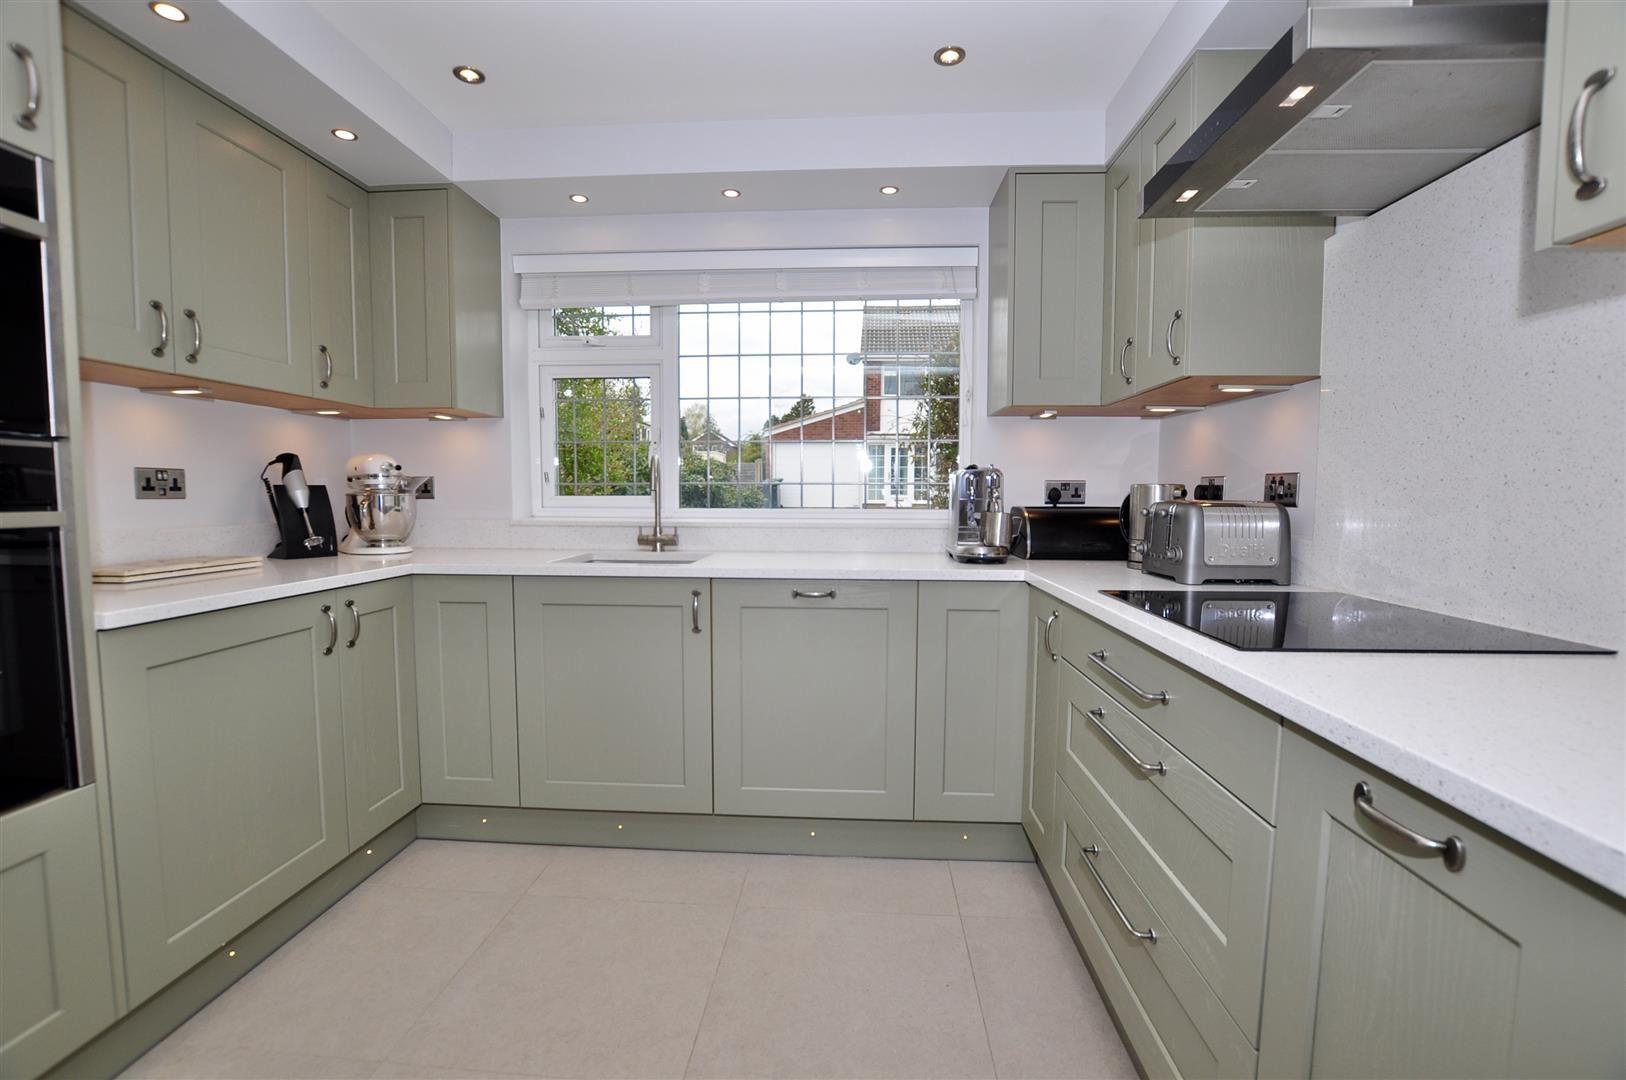 4 bed link-detached-house for sale in Hagley  - Property Image 5